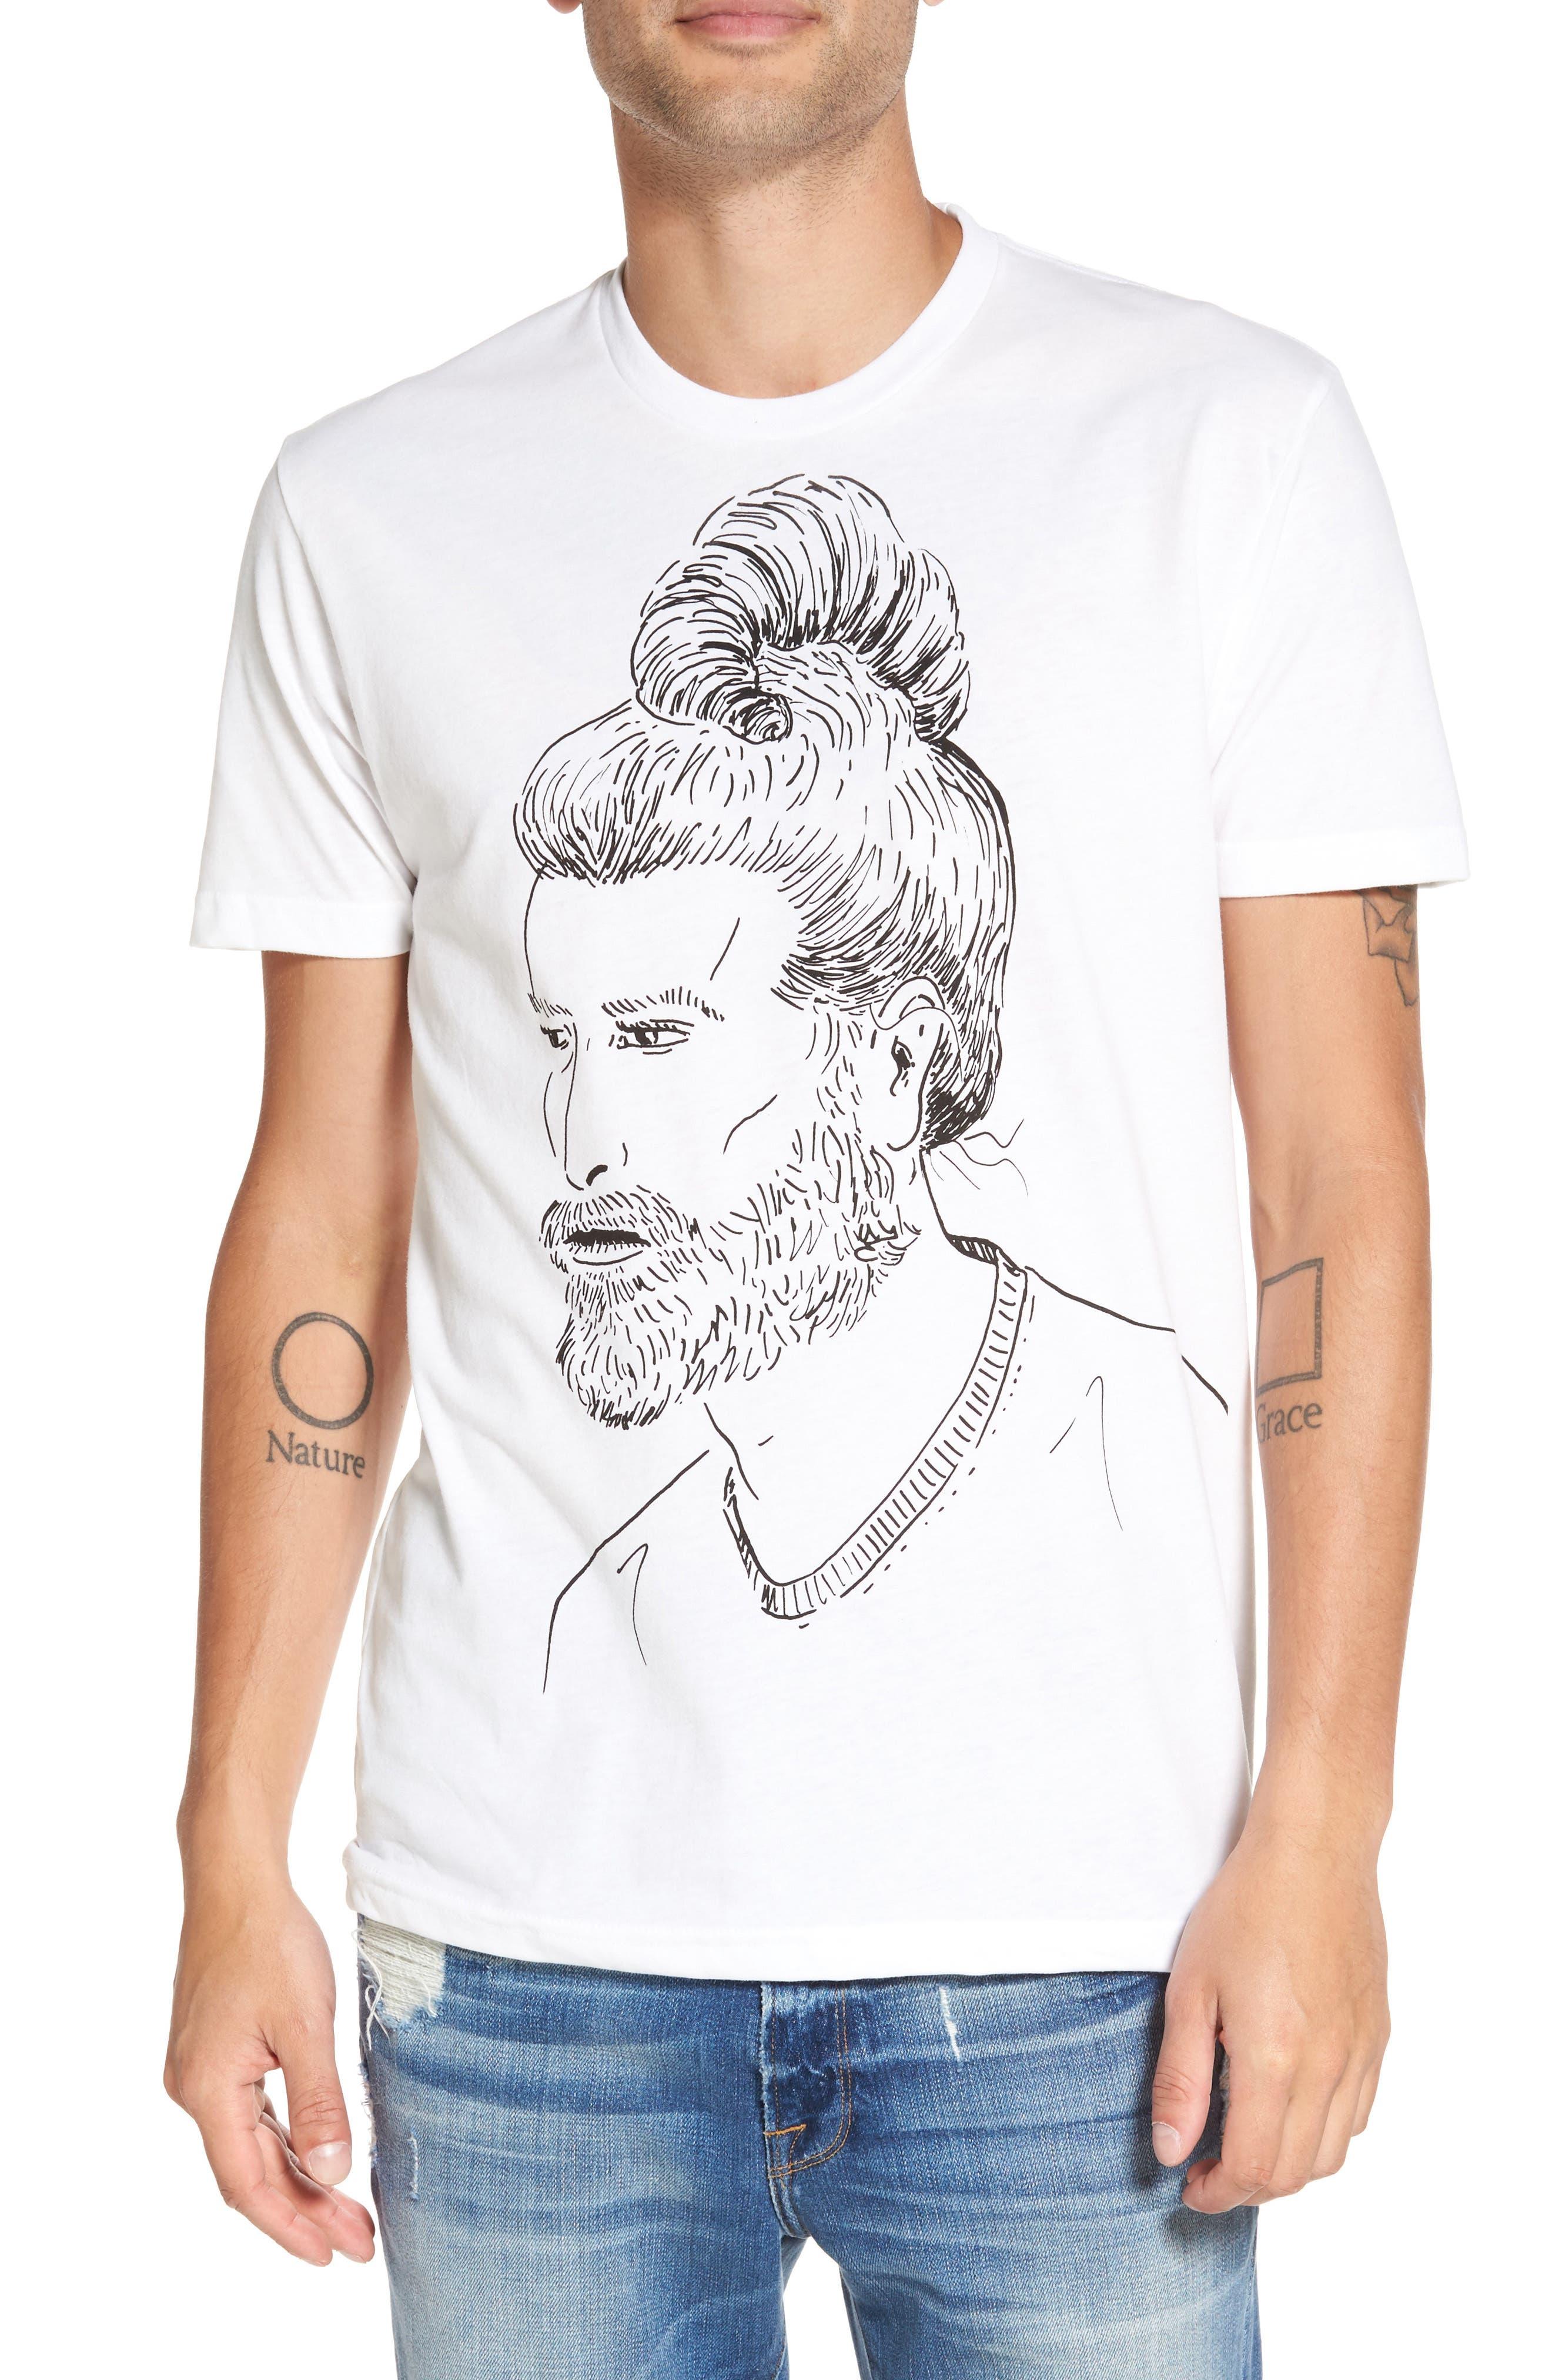 PalmerCash Man Croissant T-Shirt